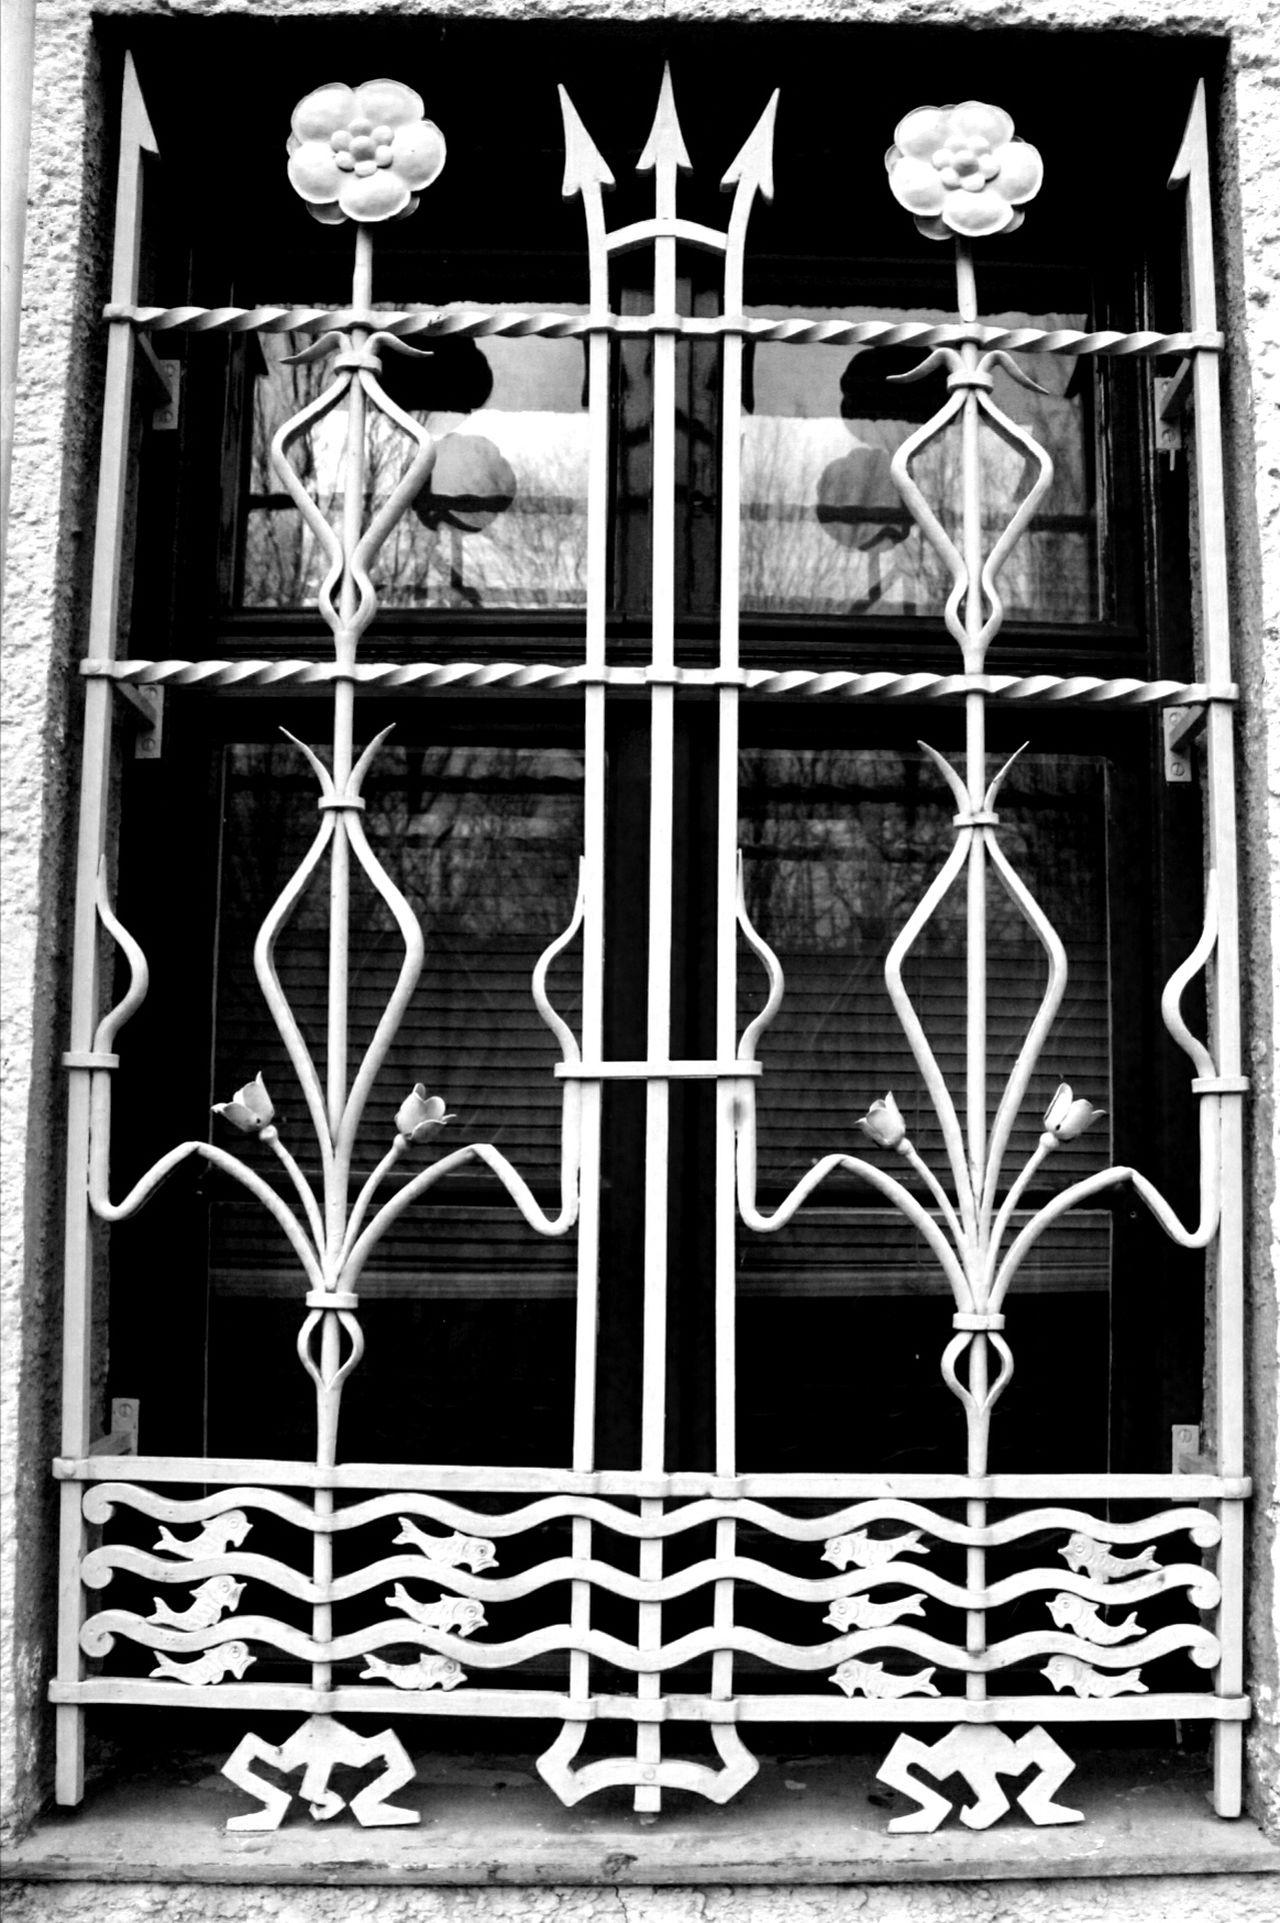 Built Structure No People Architecture Iron - Metal Day Window Windowdesign Blackandwhite Black & White Black And White Photography Schwarzweiß Schwarz & Weiß Schwarzweißfotografie